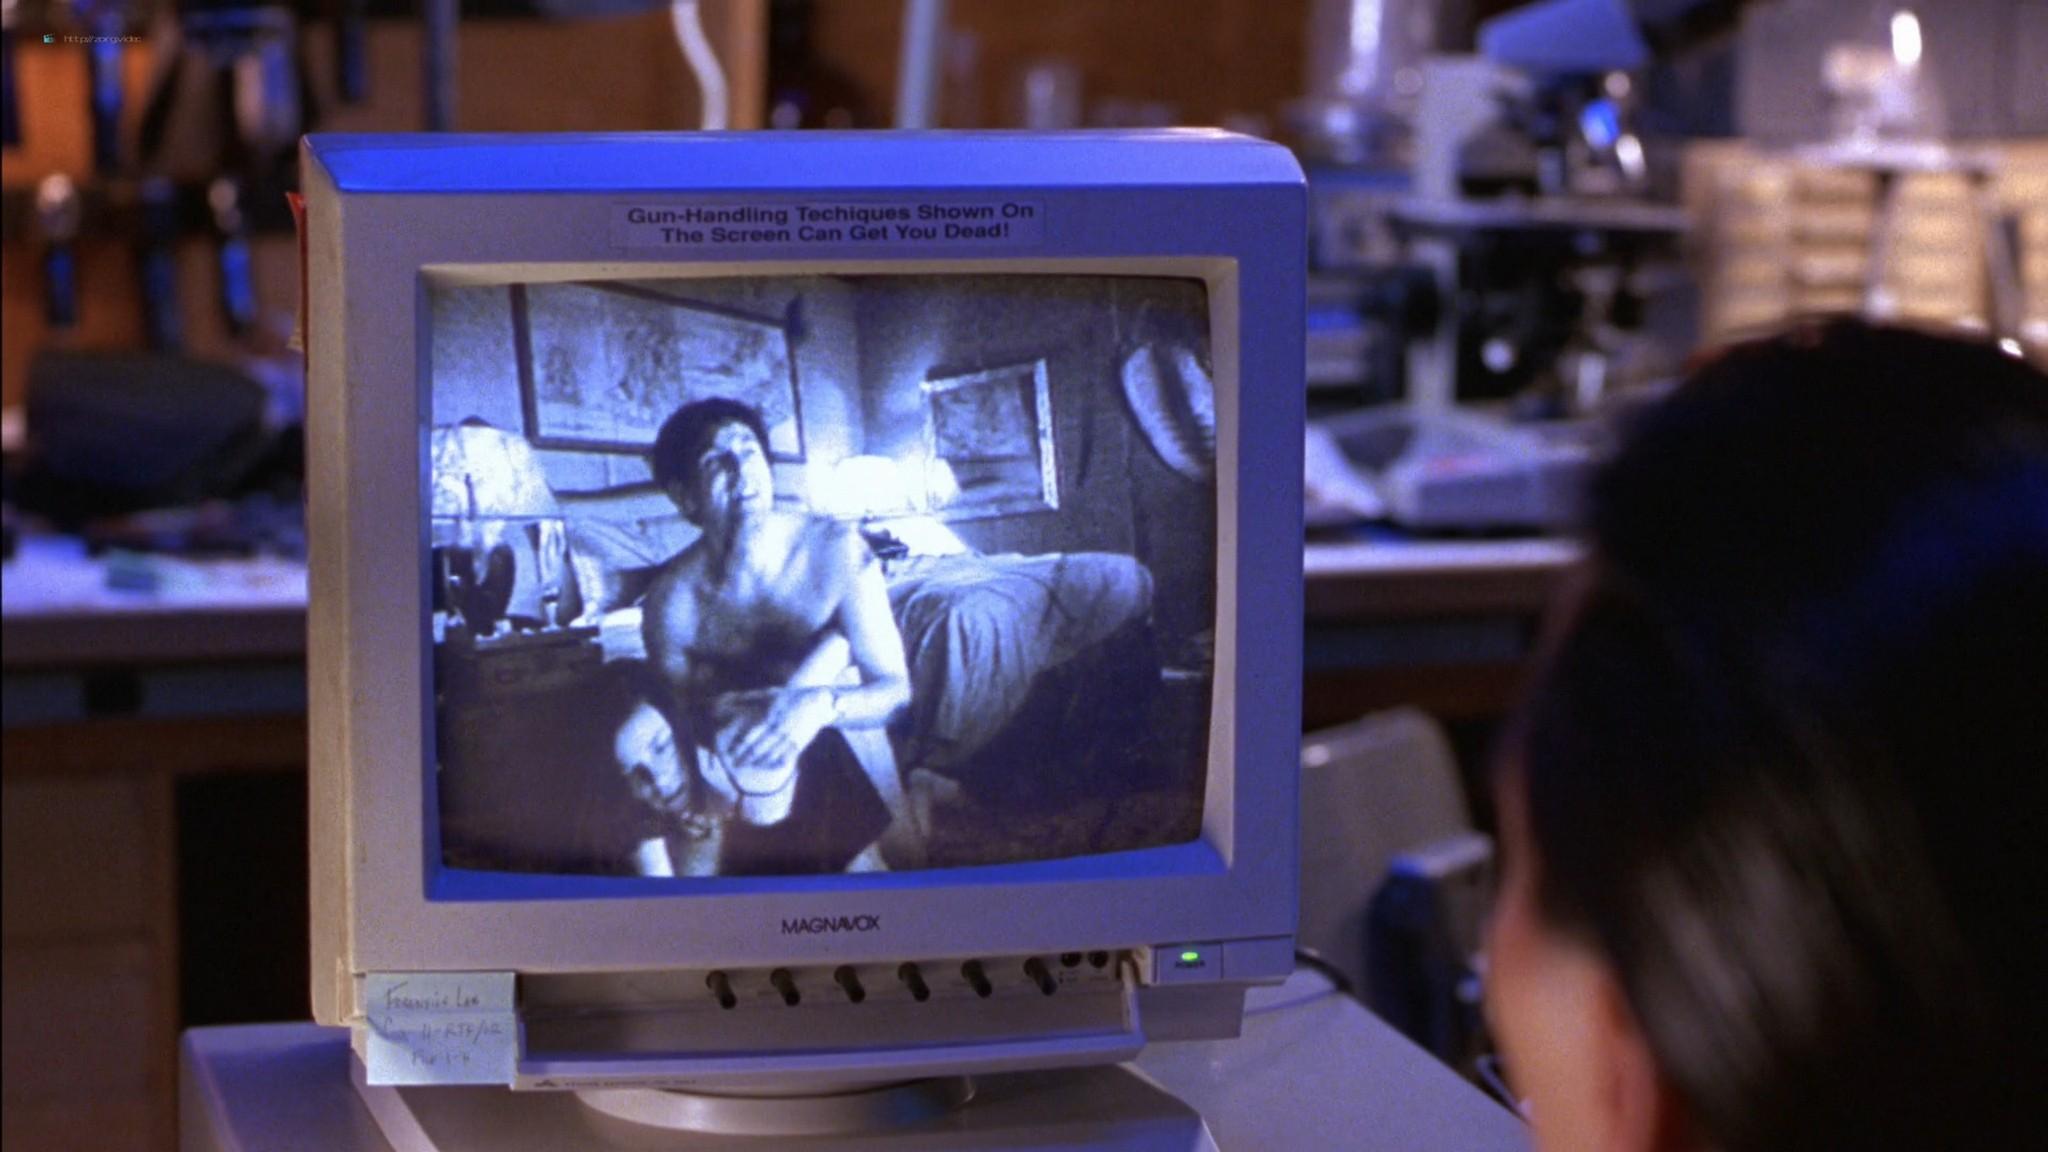 Linda Fiorentino nude Angie Everhart nude full frontal - Jade (1995) HD 1080p BluRay (14)